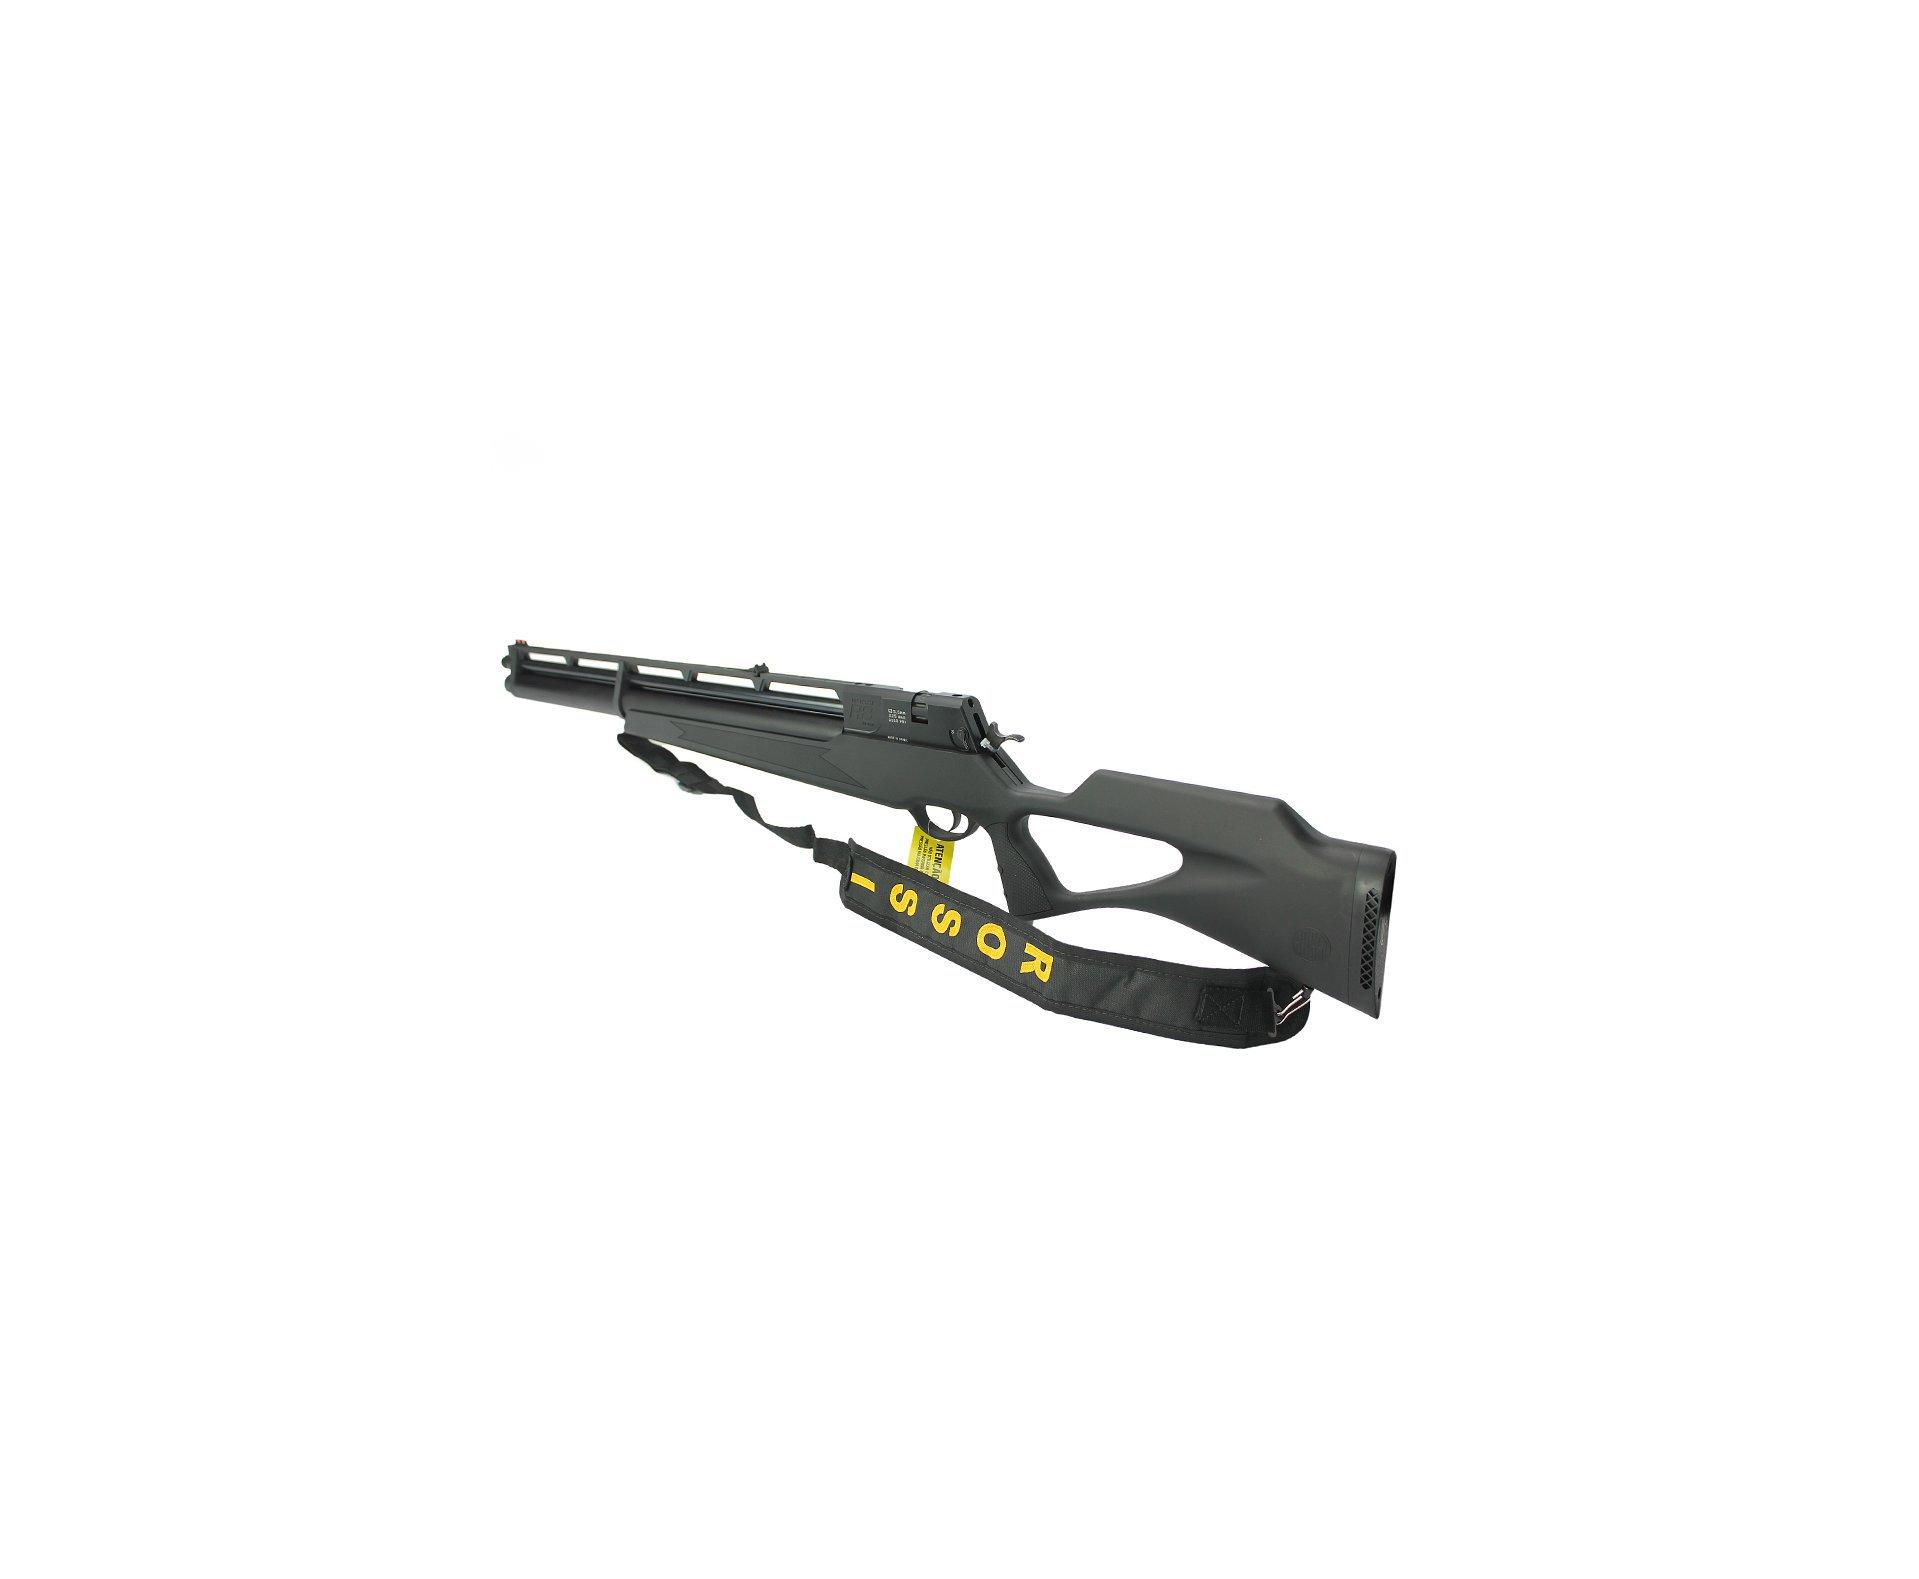 Carabina De Pressão Pcp Rossi R8 Black 5,5mm 8 Tiros 350 M/s + Bomba Pneumatica + Luneta 4-16x50